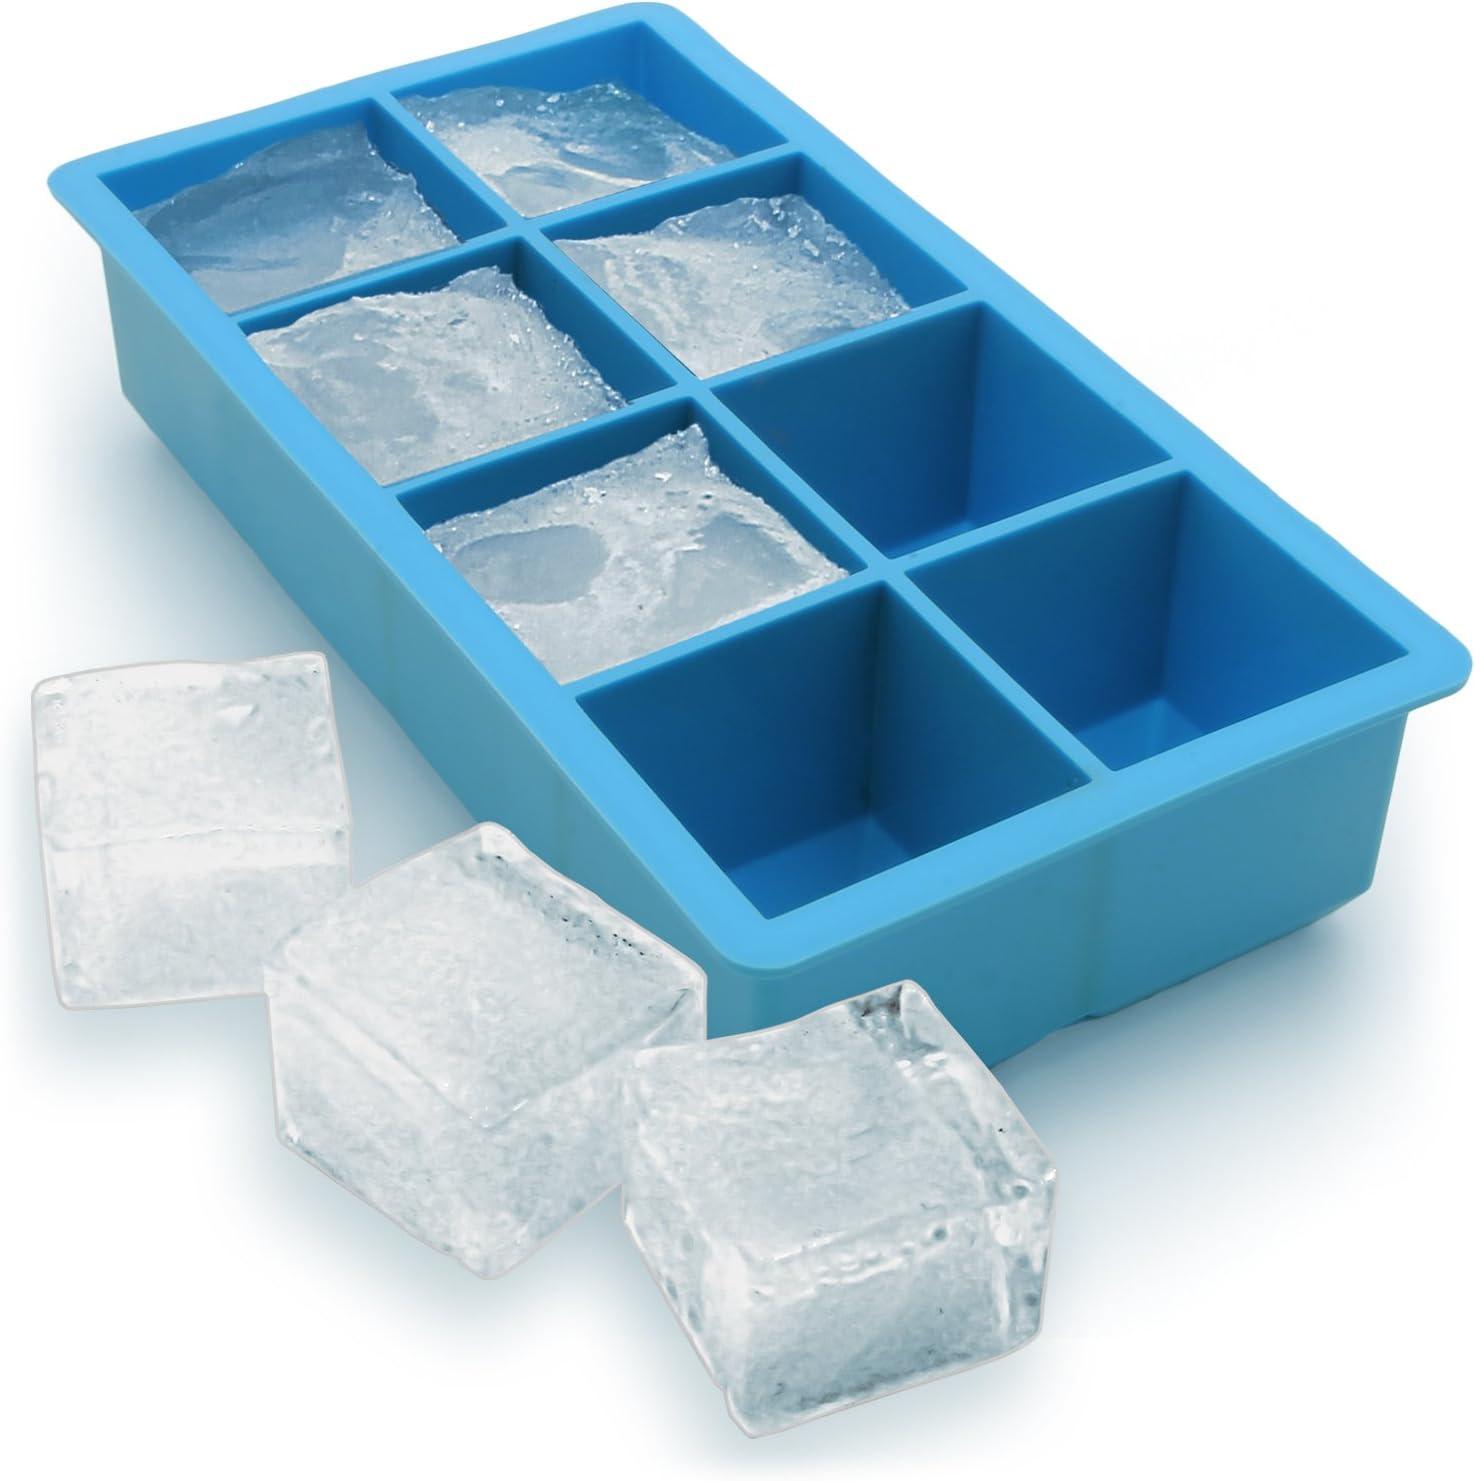 iGadgitz Home Silicone Ice Cube Tray 8 Extra Large Square Food Grade Jumbo Ice  Cube Moulds: Amazon.co.uk: Sports & Outdoors